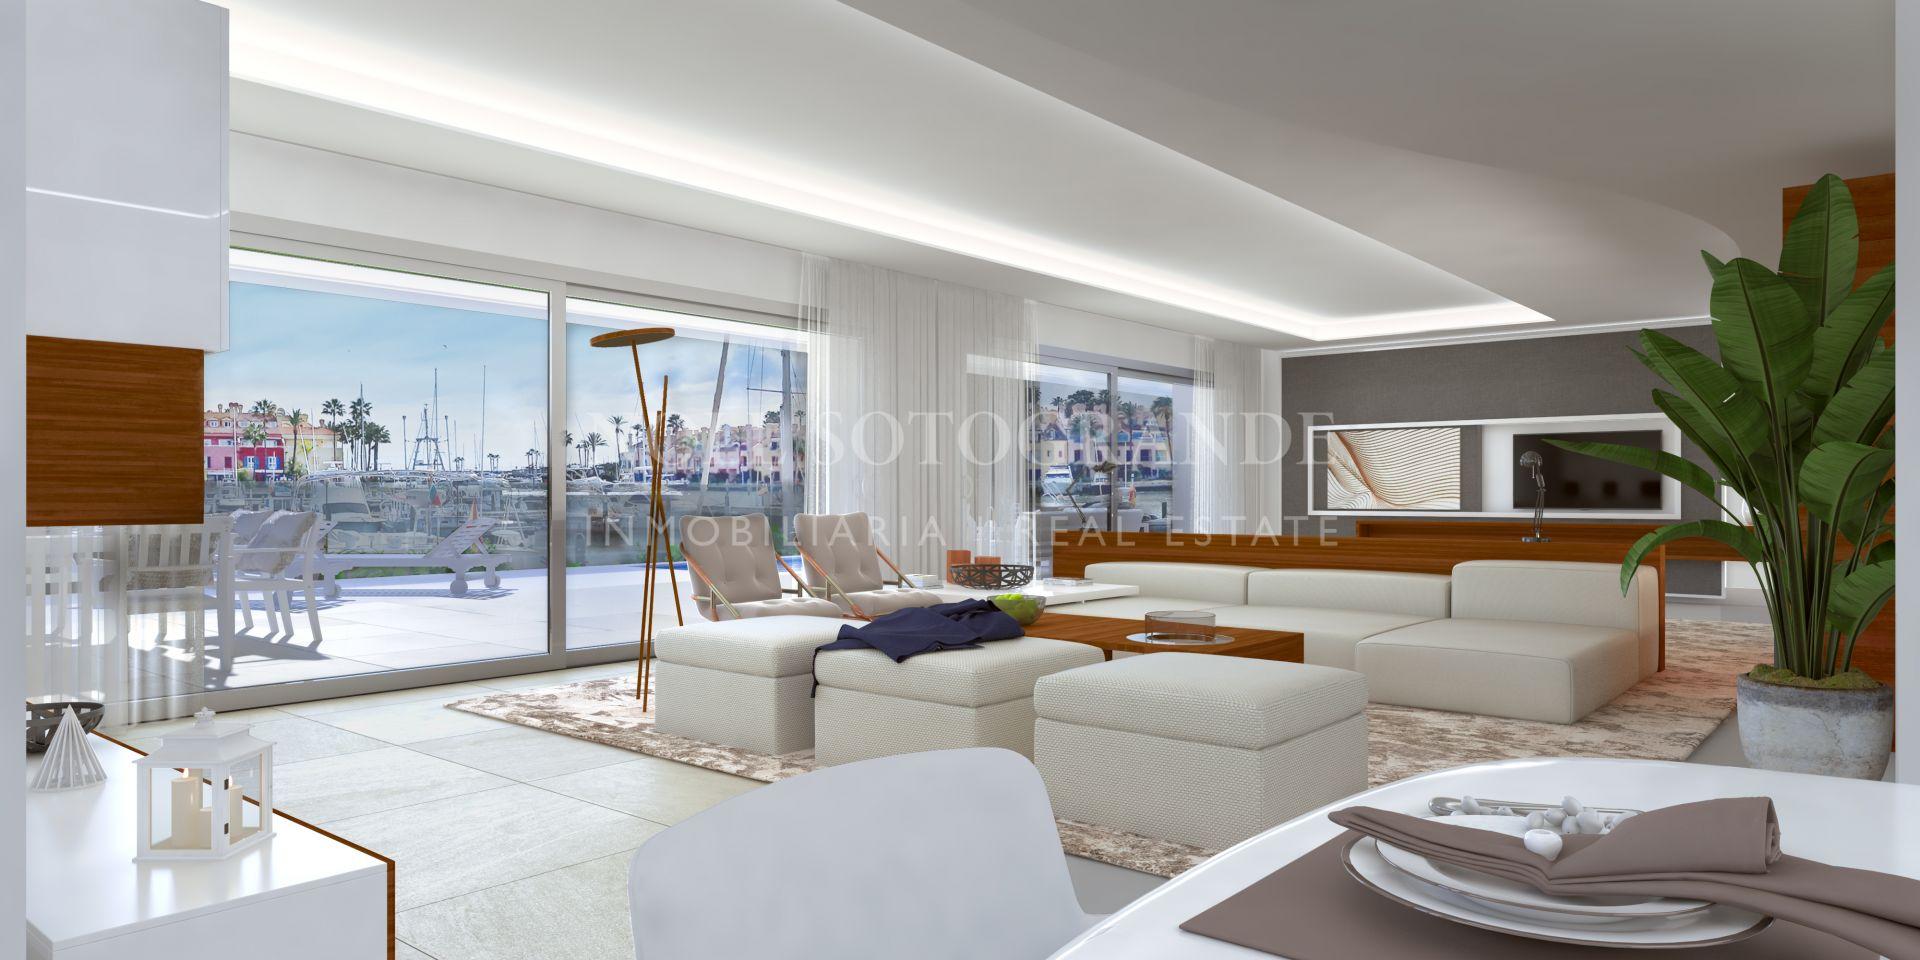 Off-plan first floor contemporary apartment Marina Sotogrande